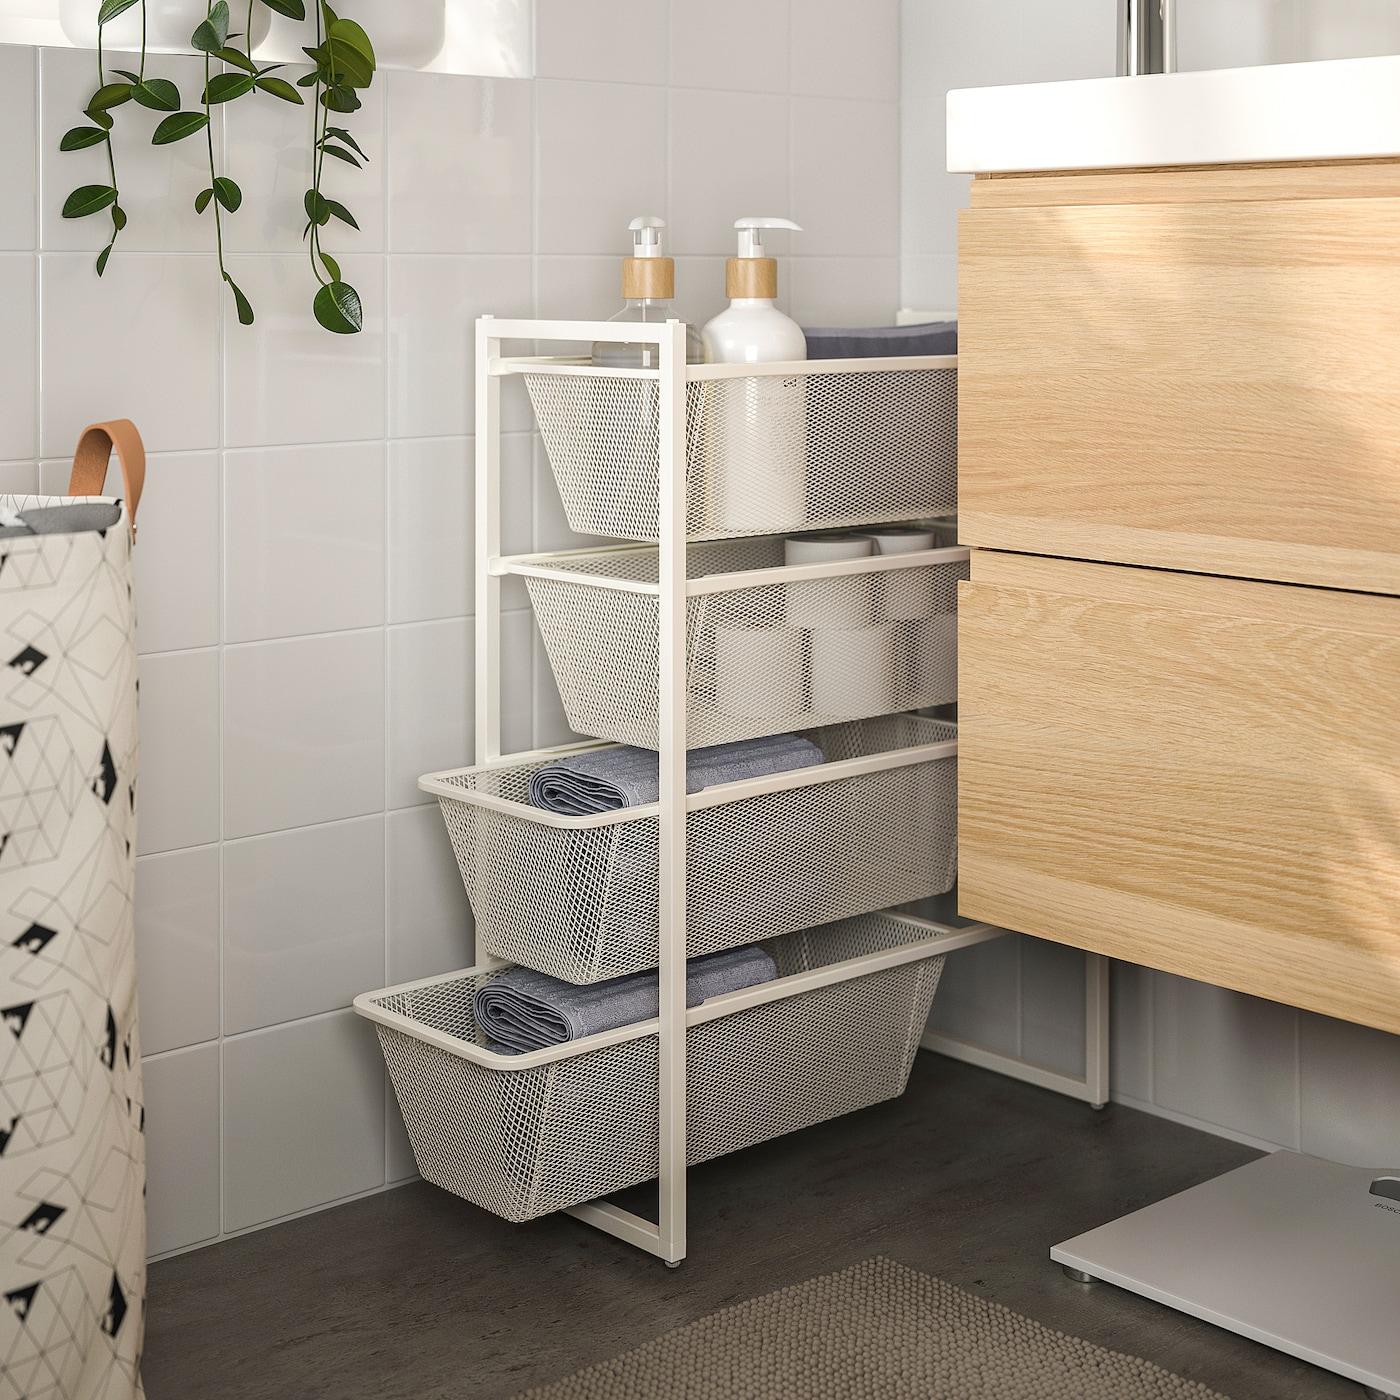 JONAXEL Frame with mesh baskets, white, 25x51x70 cm